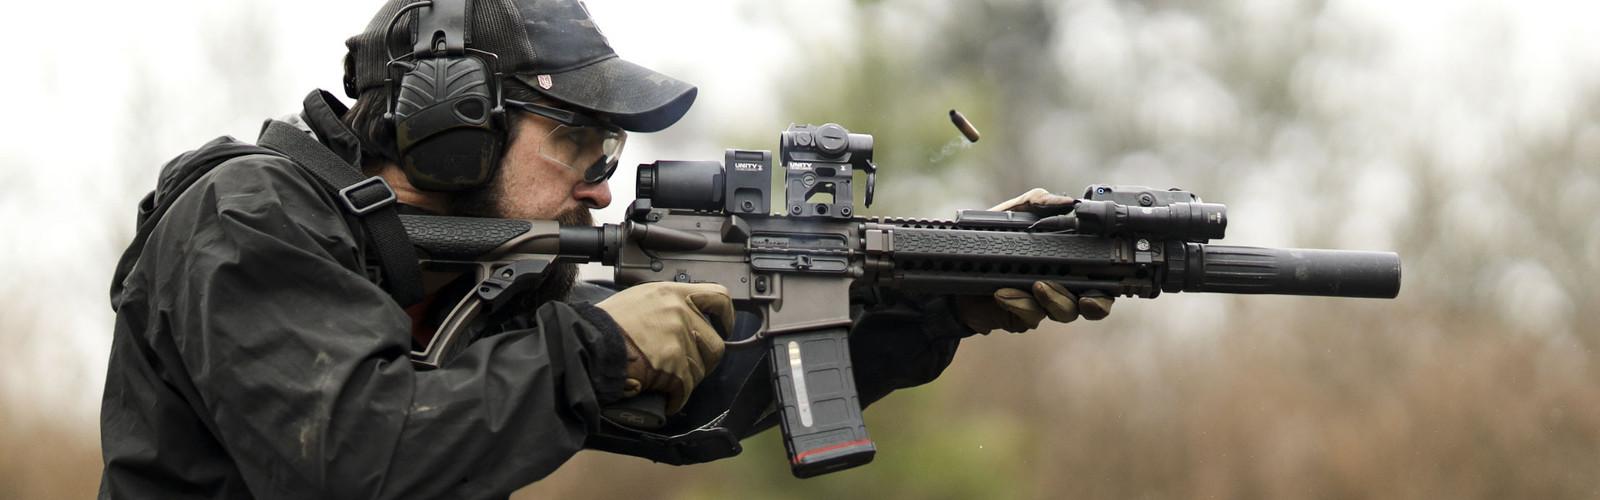 Rifle Courses